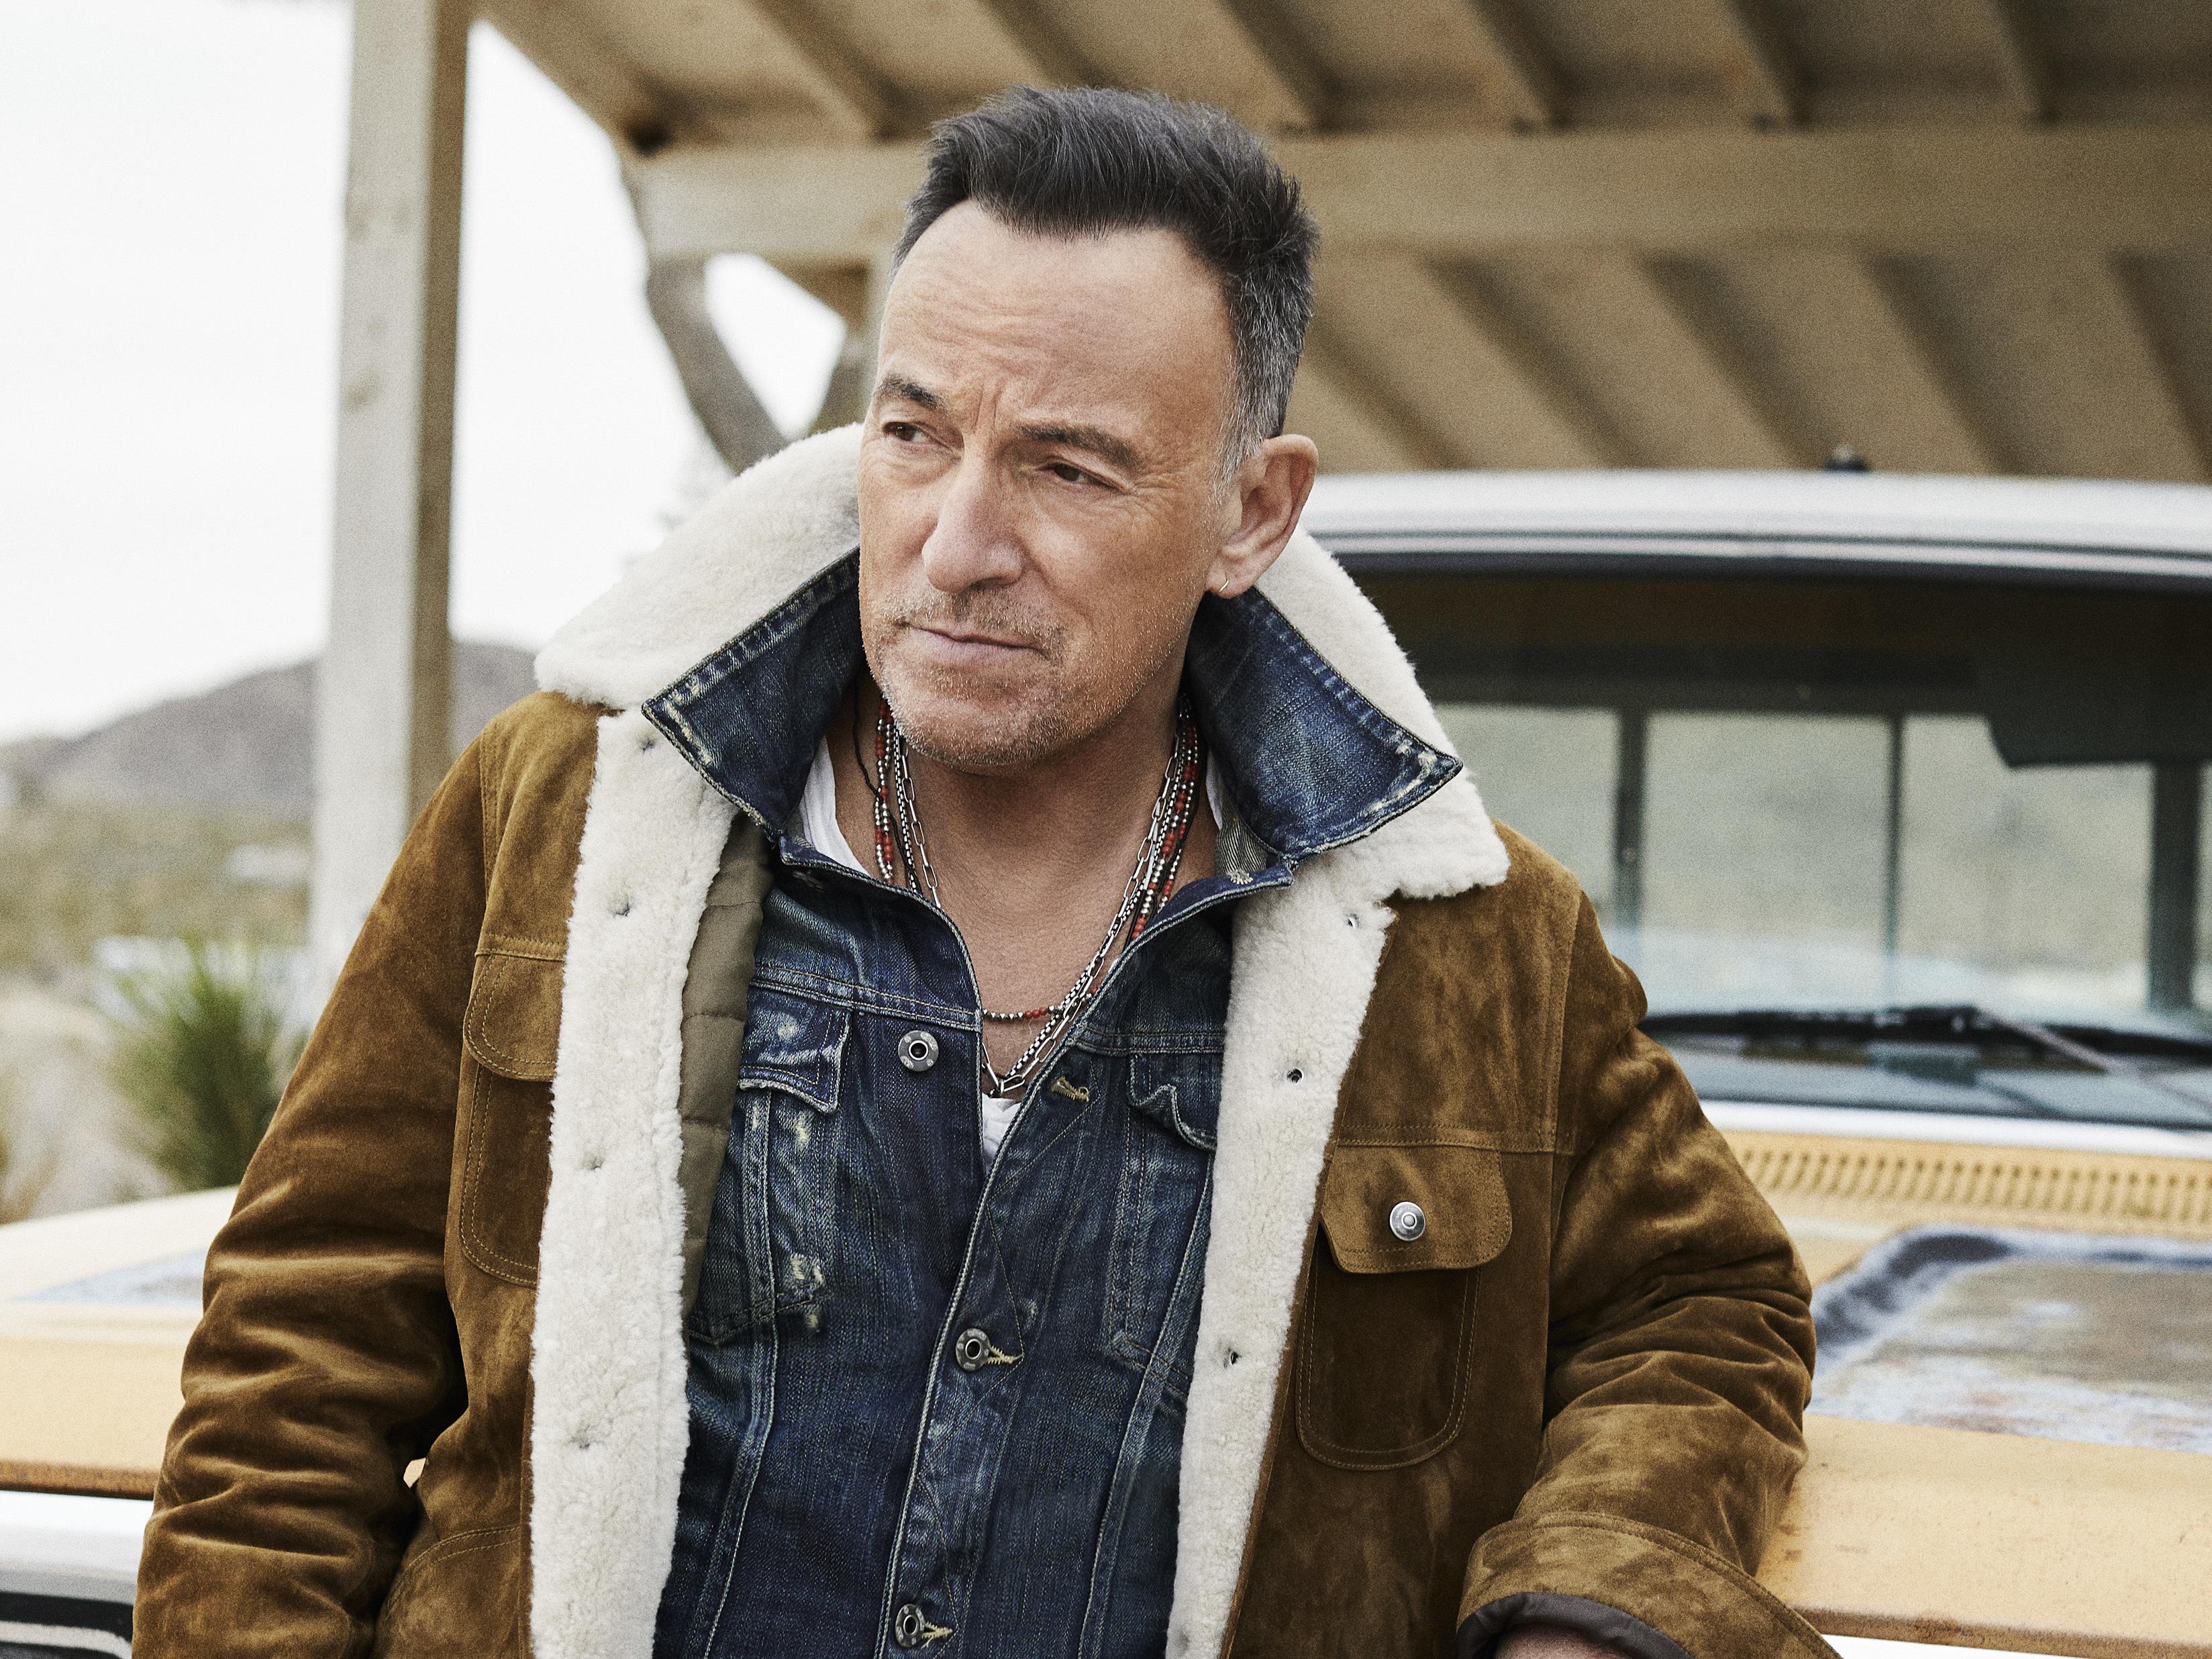 Bruce Springsteen Announces New Album 'Western Stars'